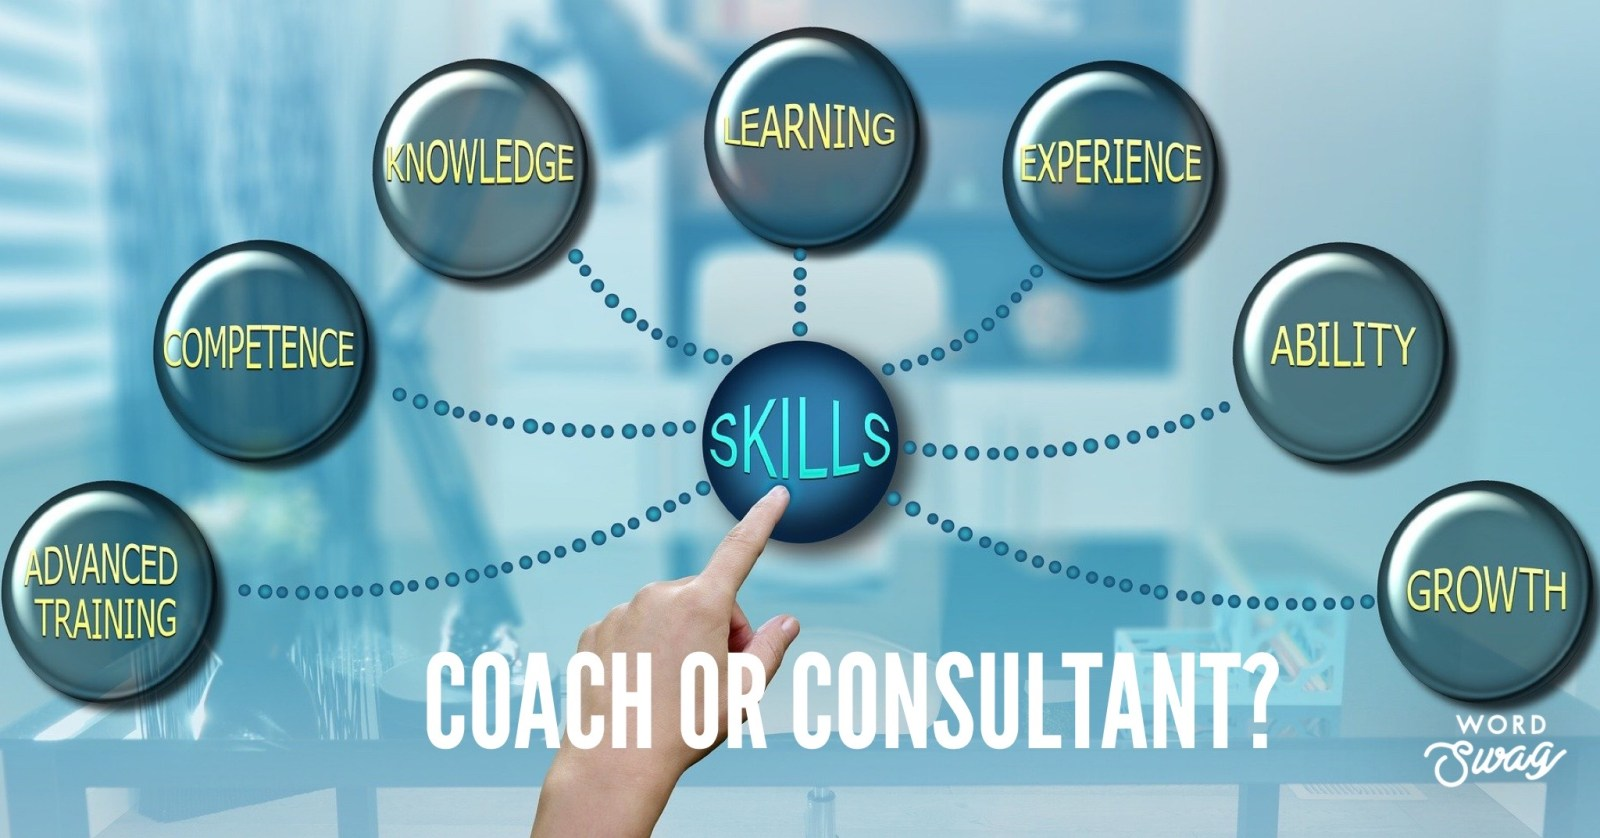 Coach or Consultant?